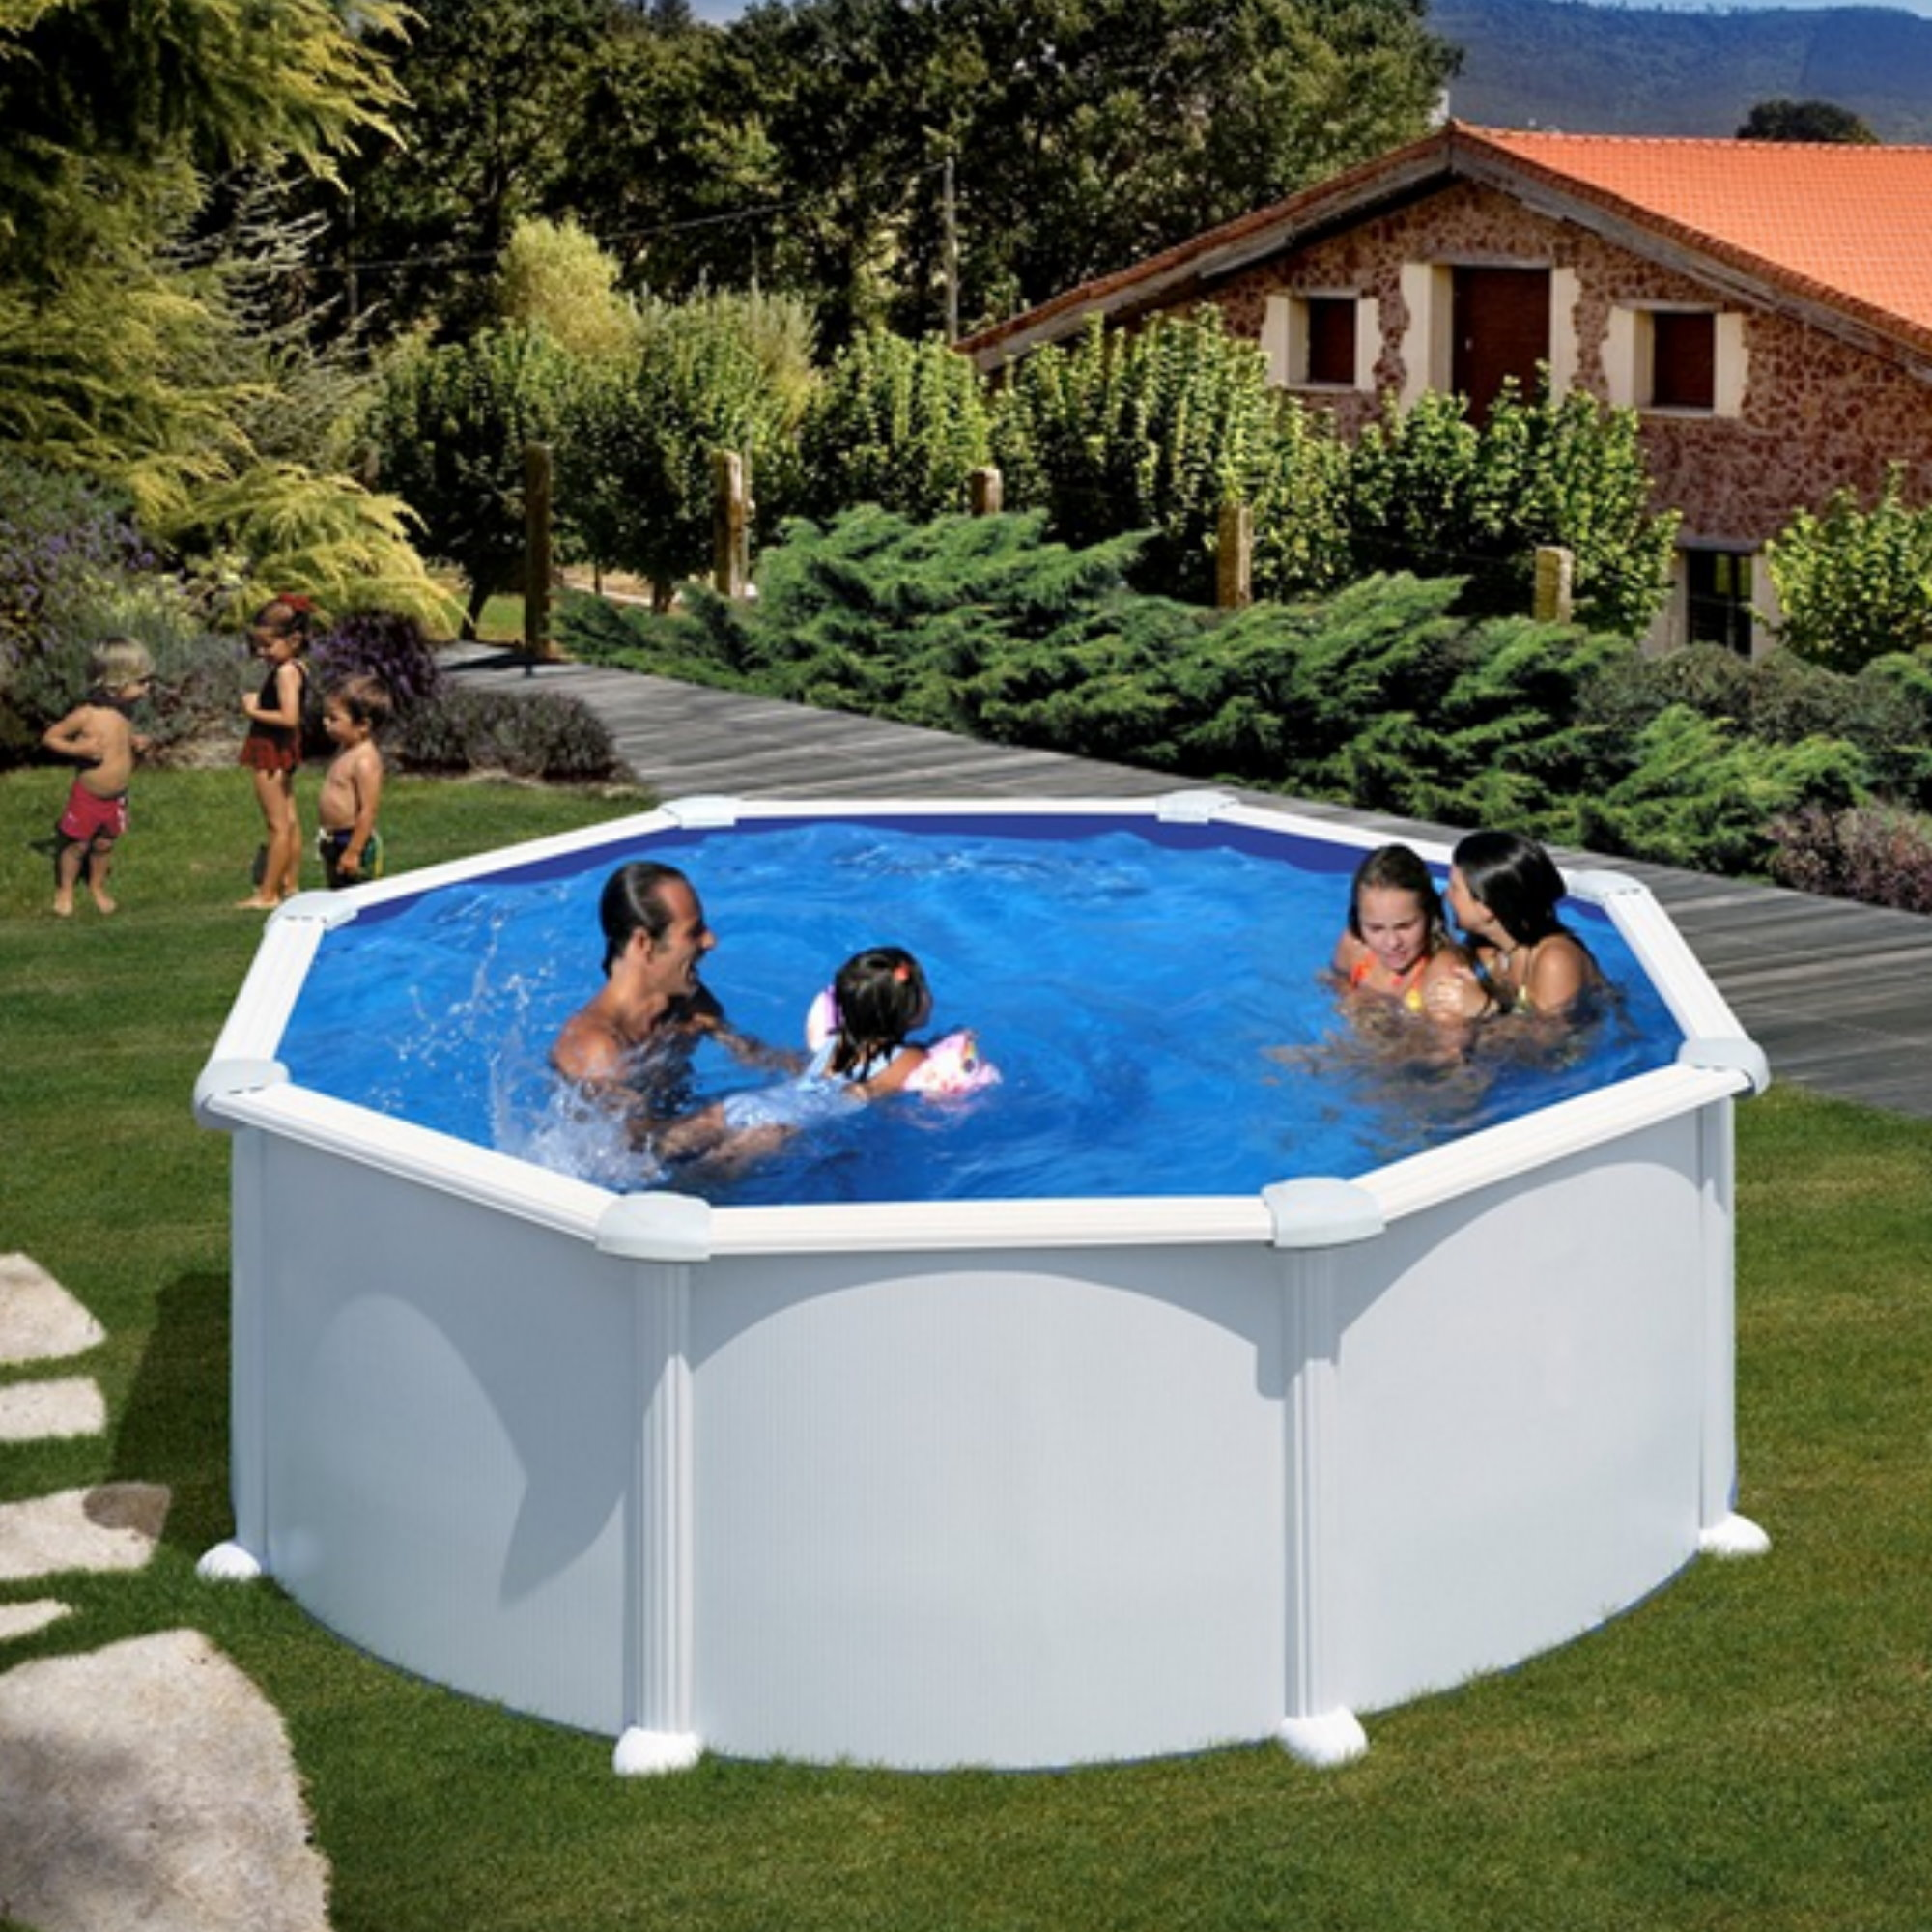 Rundformbeckenset stahloptik bali 300 cm x 120 cm pool for Pool 120 cm tief